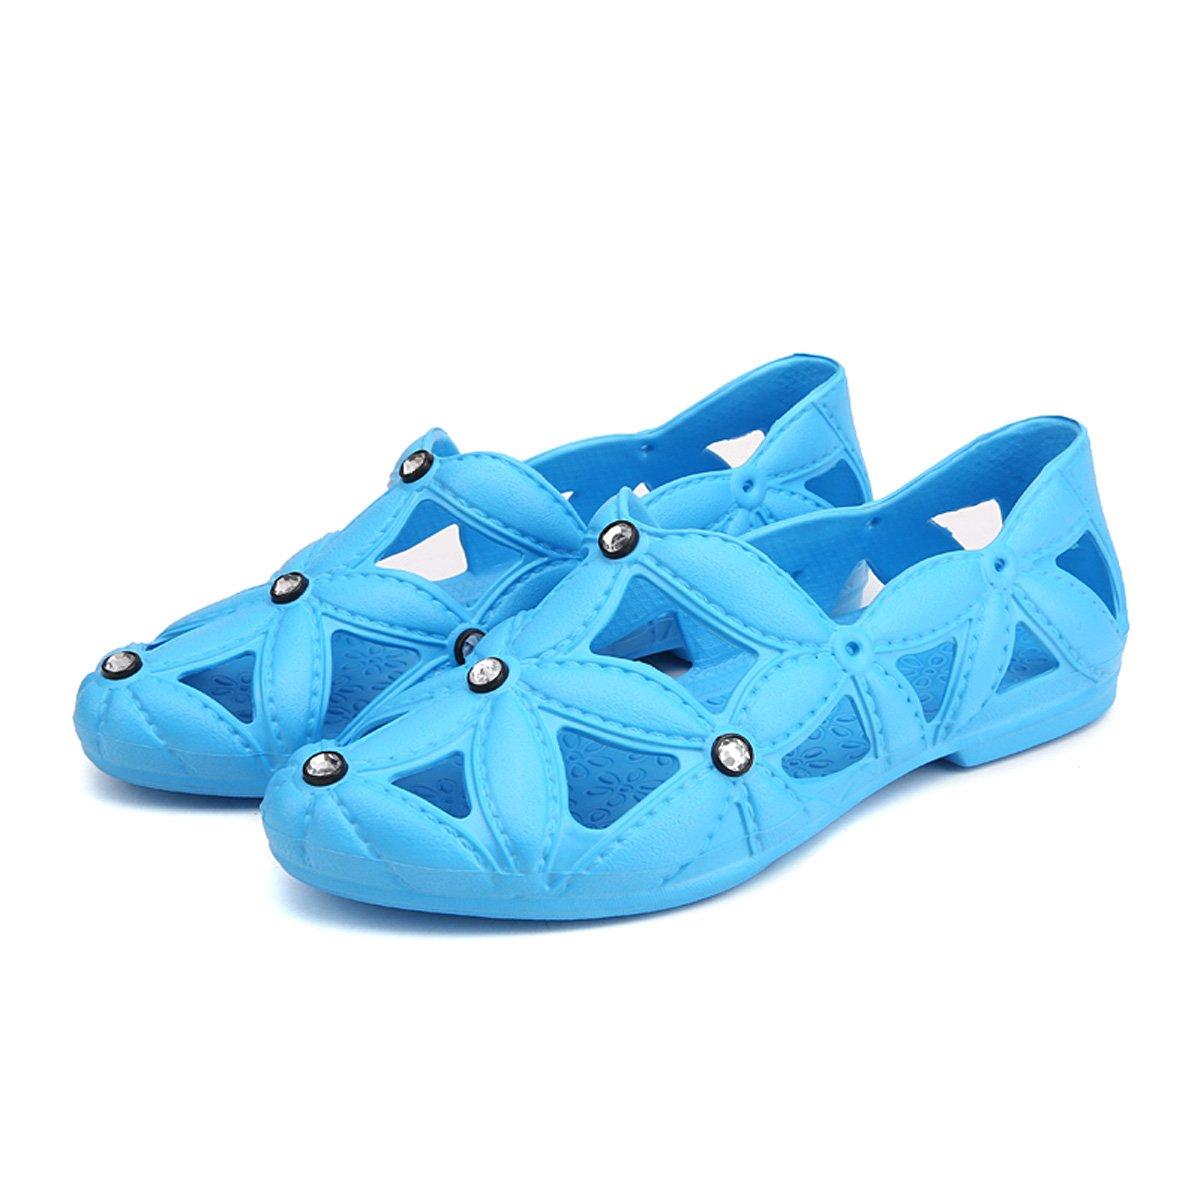 da69b61ad gracosy Zapatos de Playa para Mujer Sandalias de Verano Hollow out Aqua  Calzado de Agua de Secado rápido Slip On Outdoor Ligero Zapatos de Lluvia  para ...